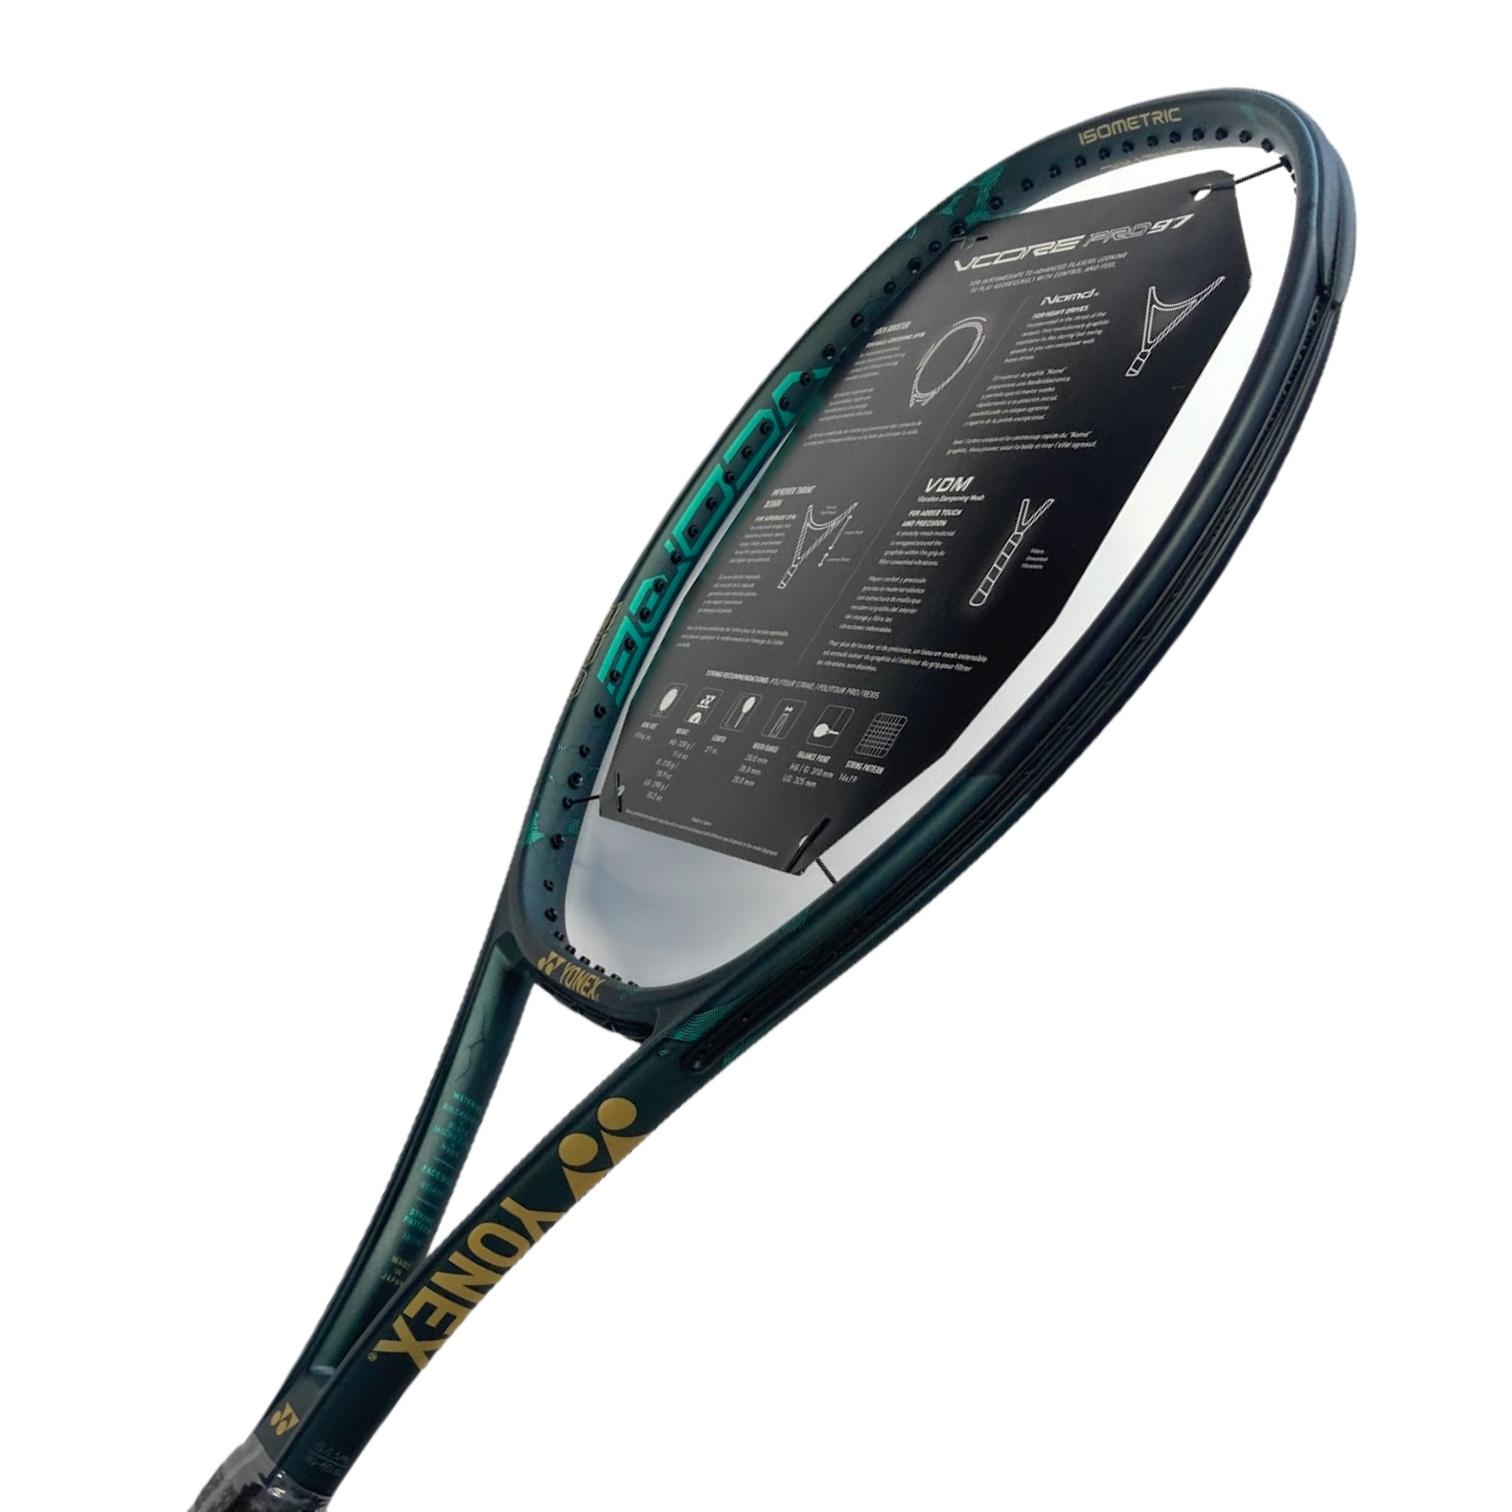 Raquete De Tênis Yonex Vcore Pro 97